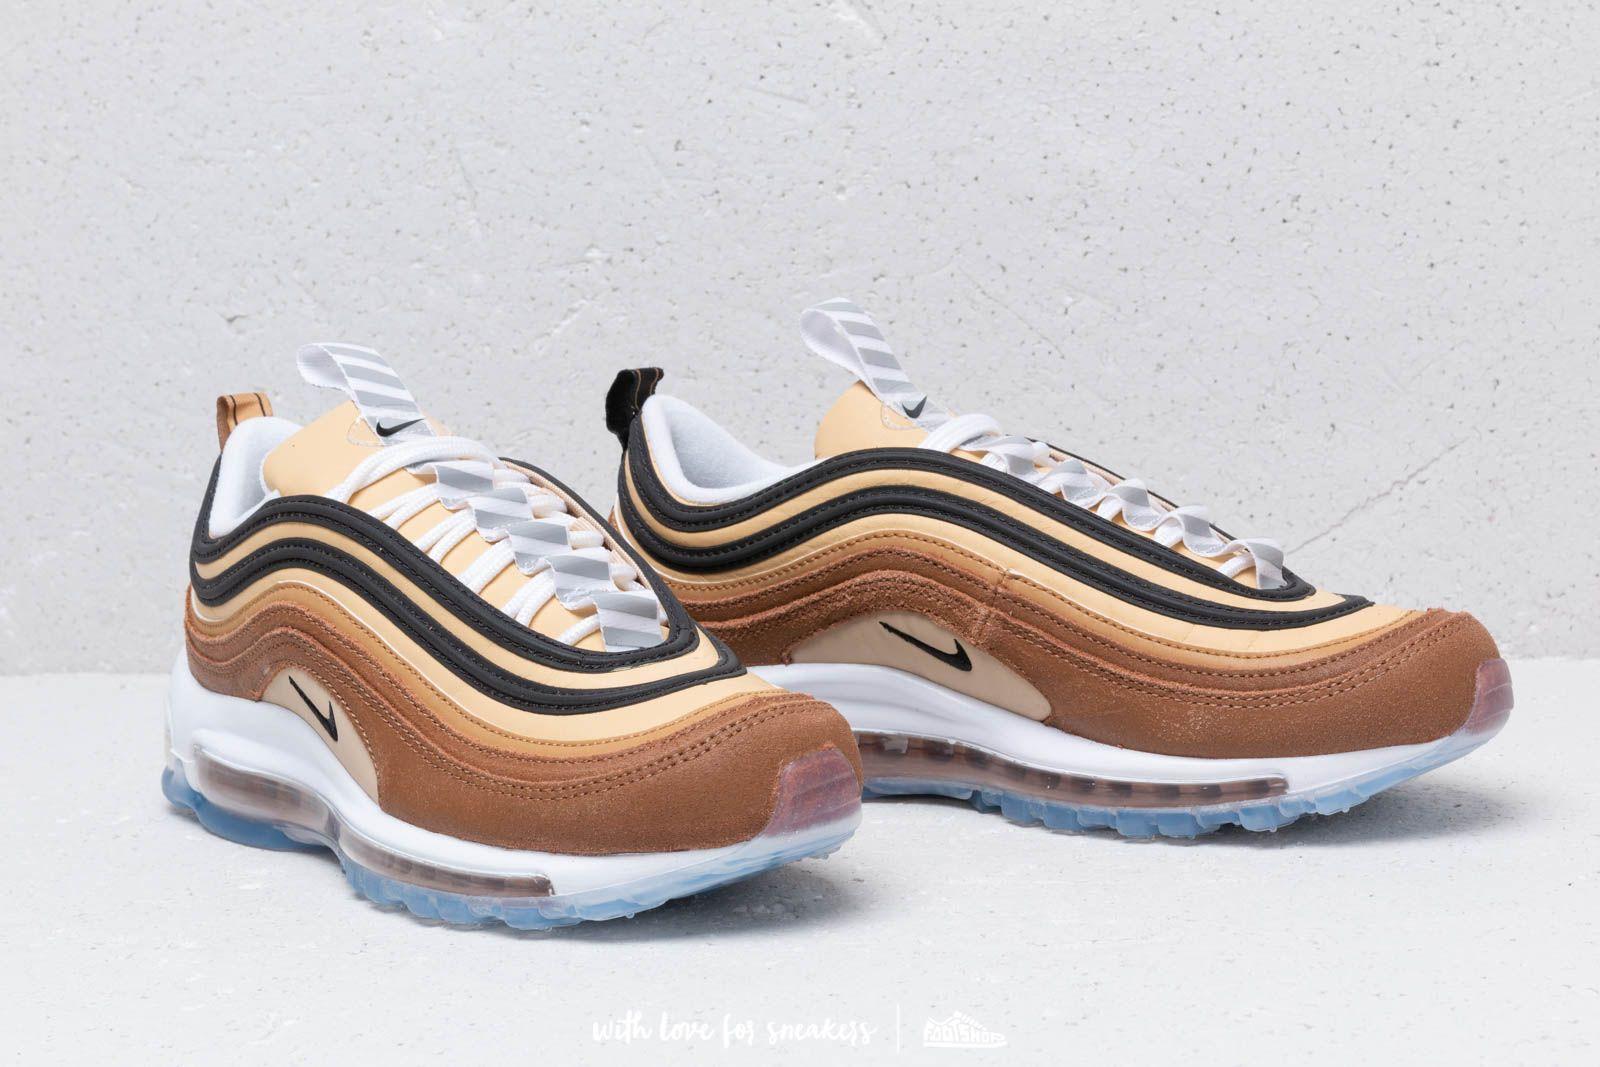 Air Max 97 Sneaker in Ale BrownBlack Elemental Gold